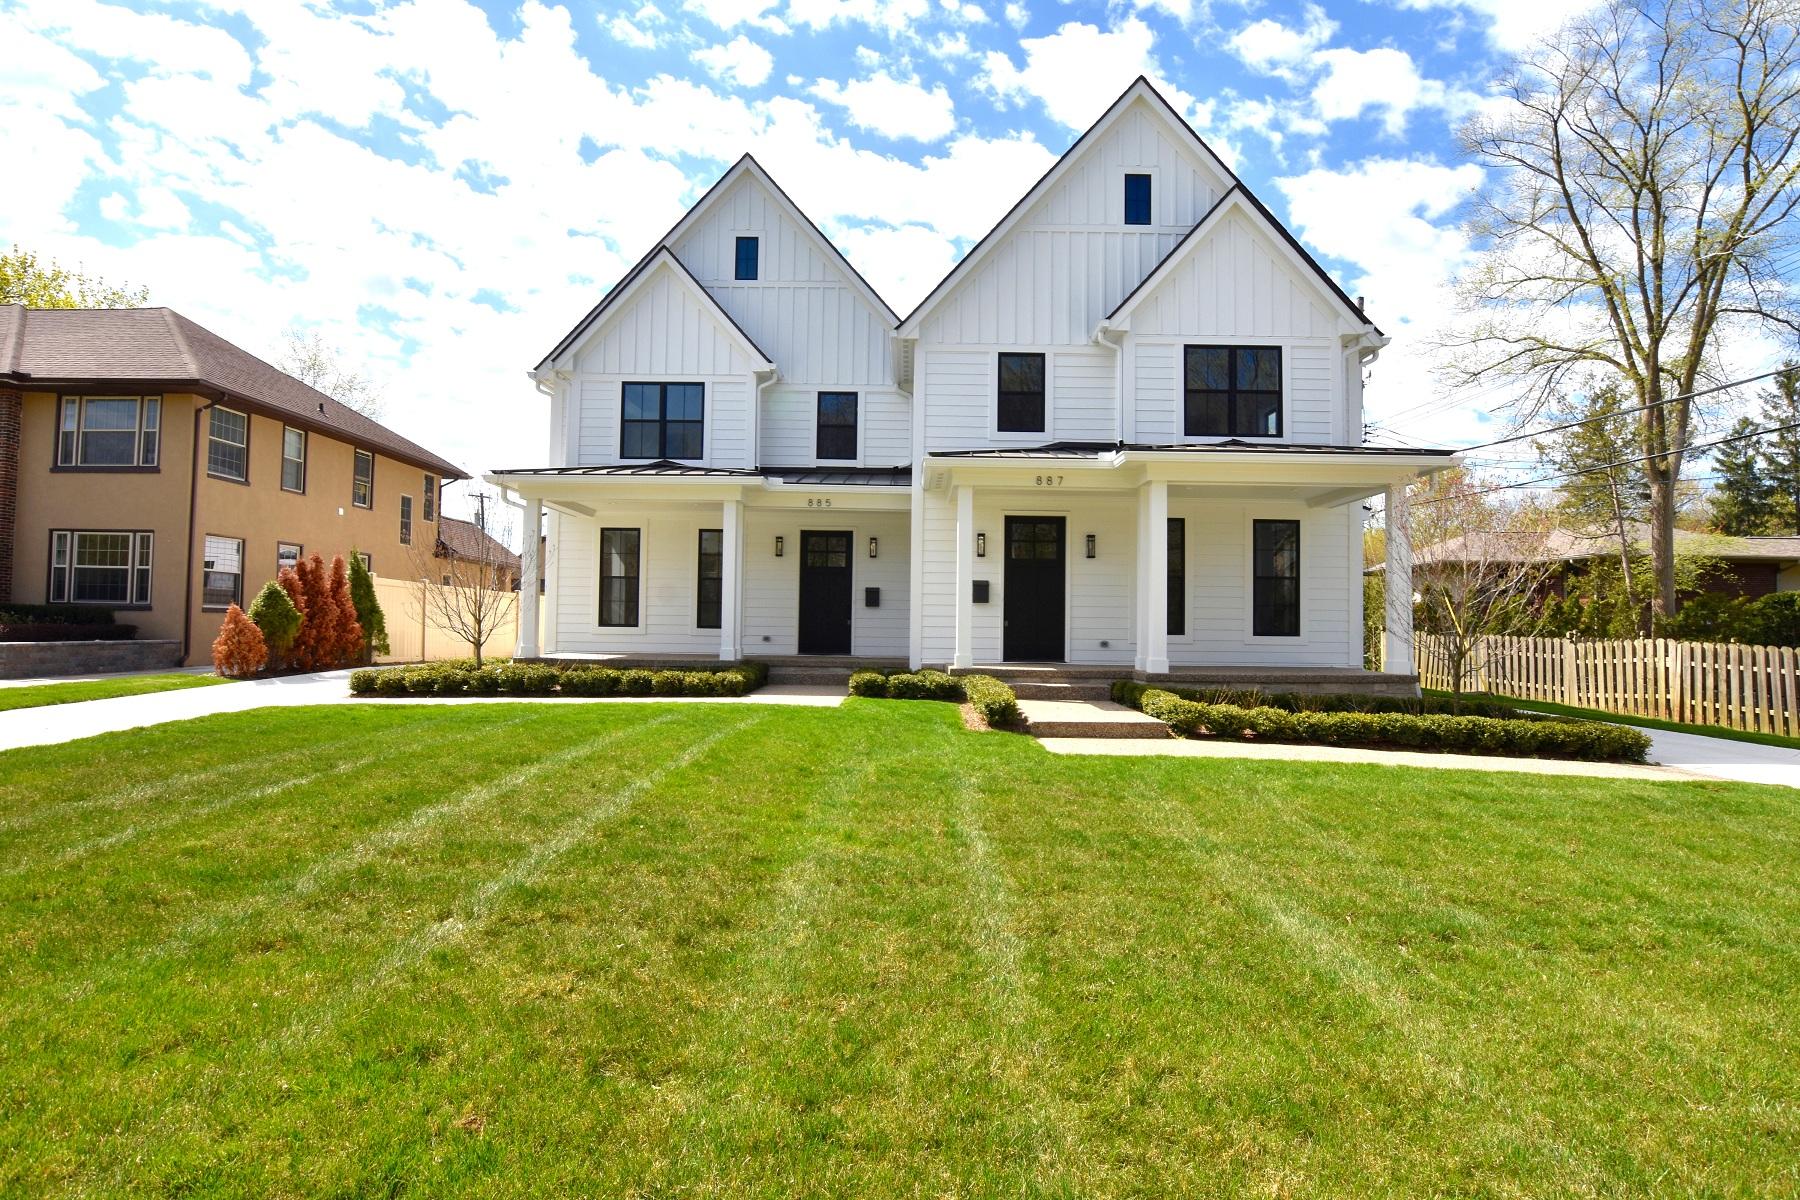 townhouses for Sale at Birmingham 887 Redding Road Birmingham, Michigan 48009 United States